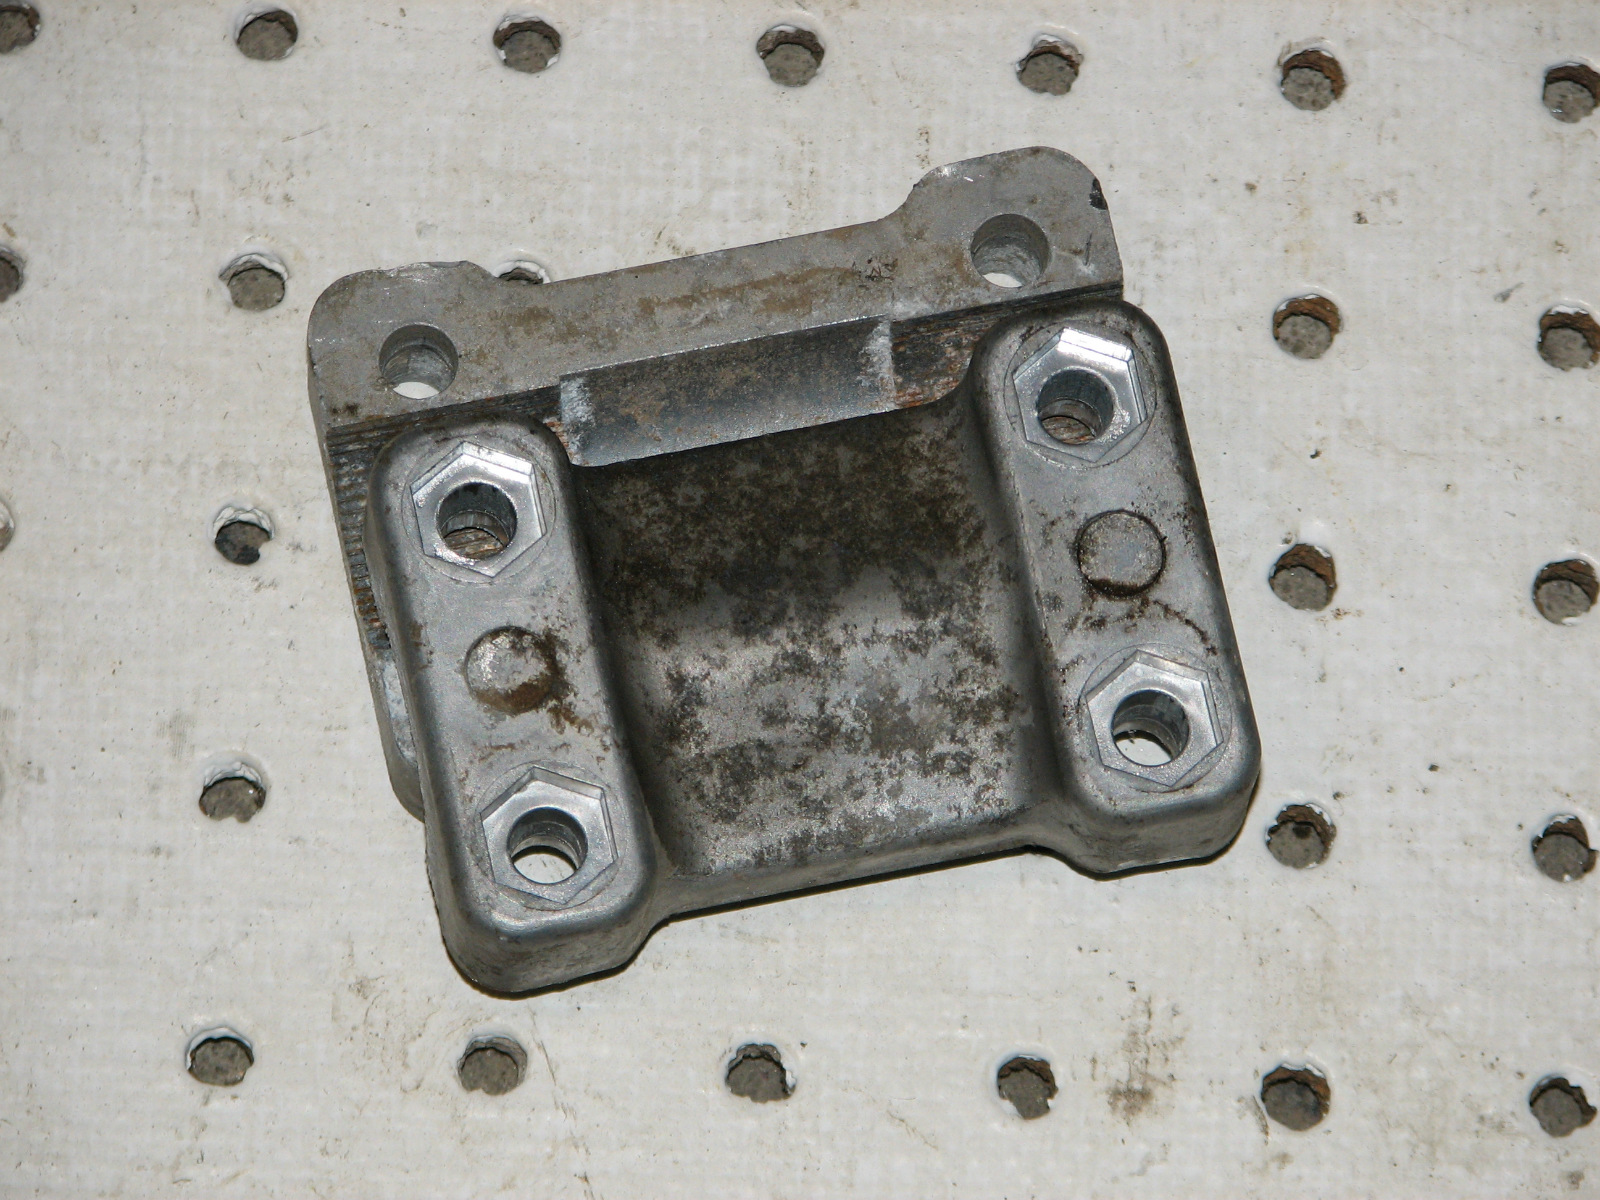 2003 POLARIS MAGNUM 330 4X4 HANDLEBAR CLAMP 56311